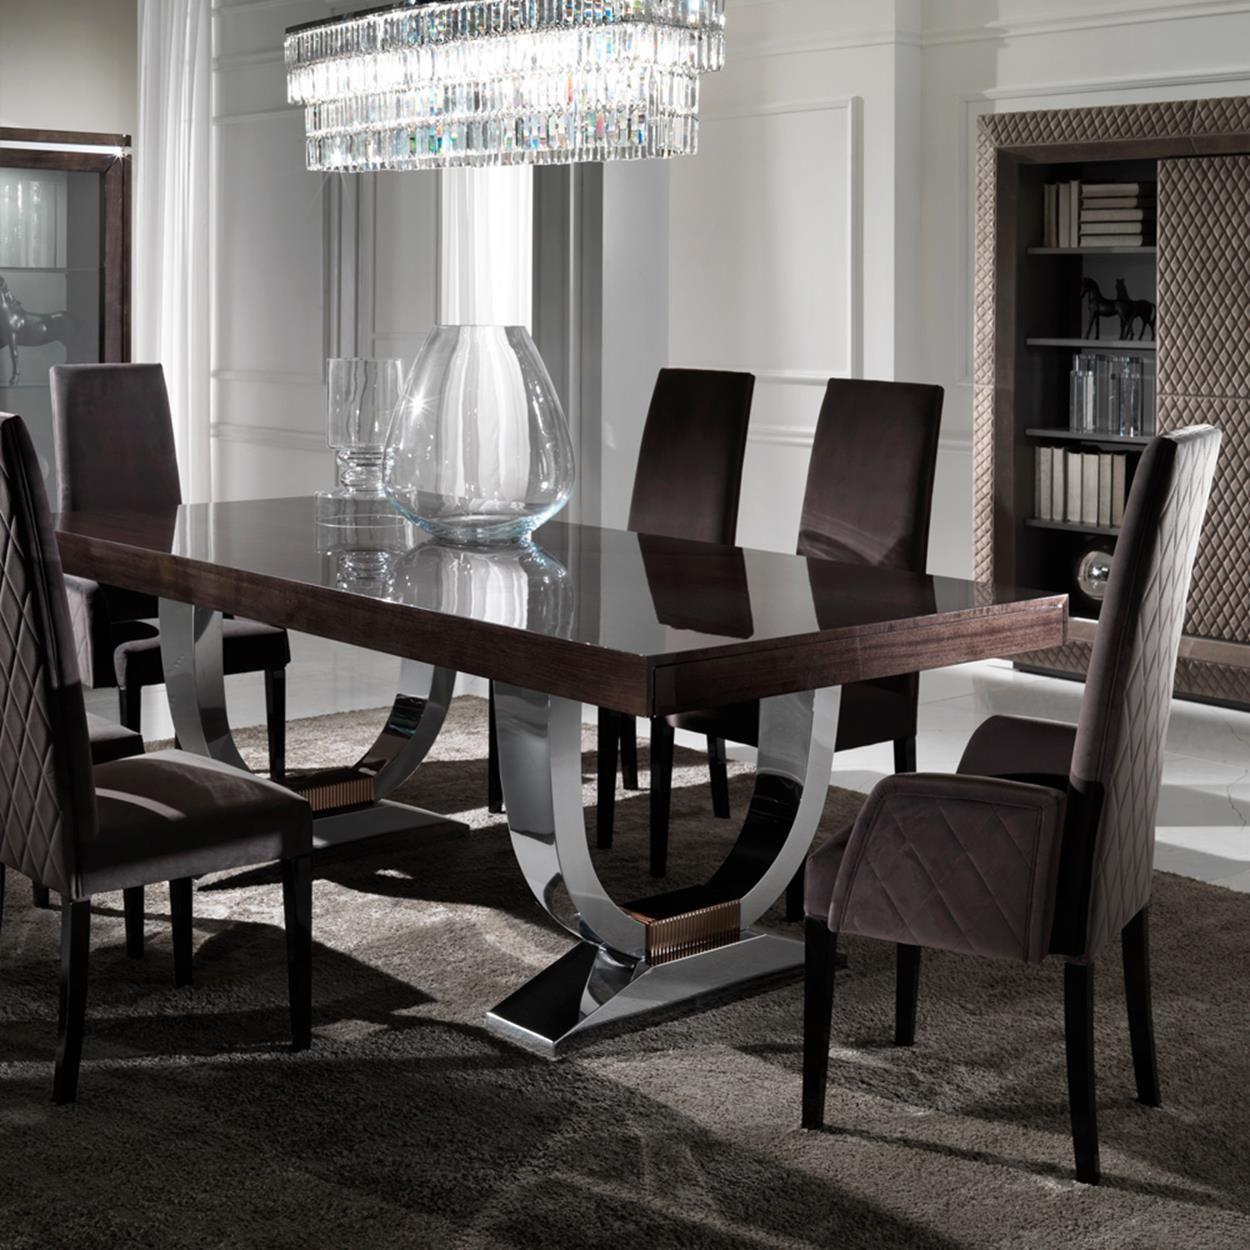 43 Luxury Modern Italian Dining Room Sets Ideas Luxury Dining